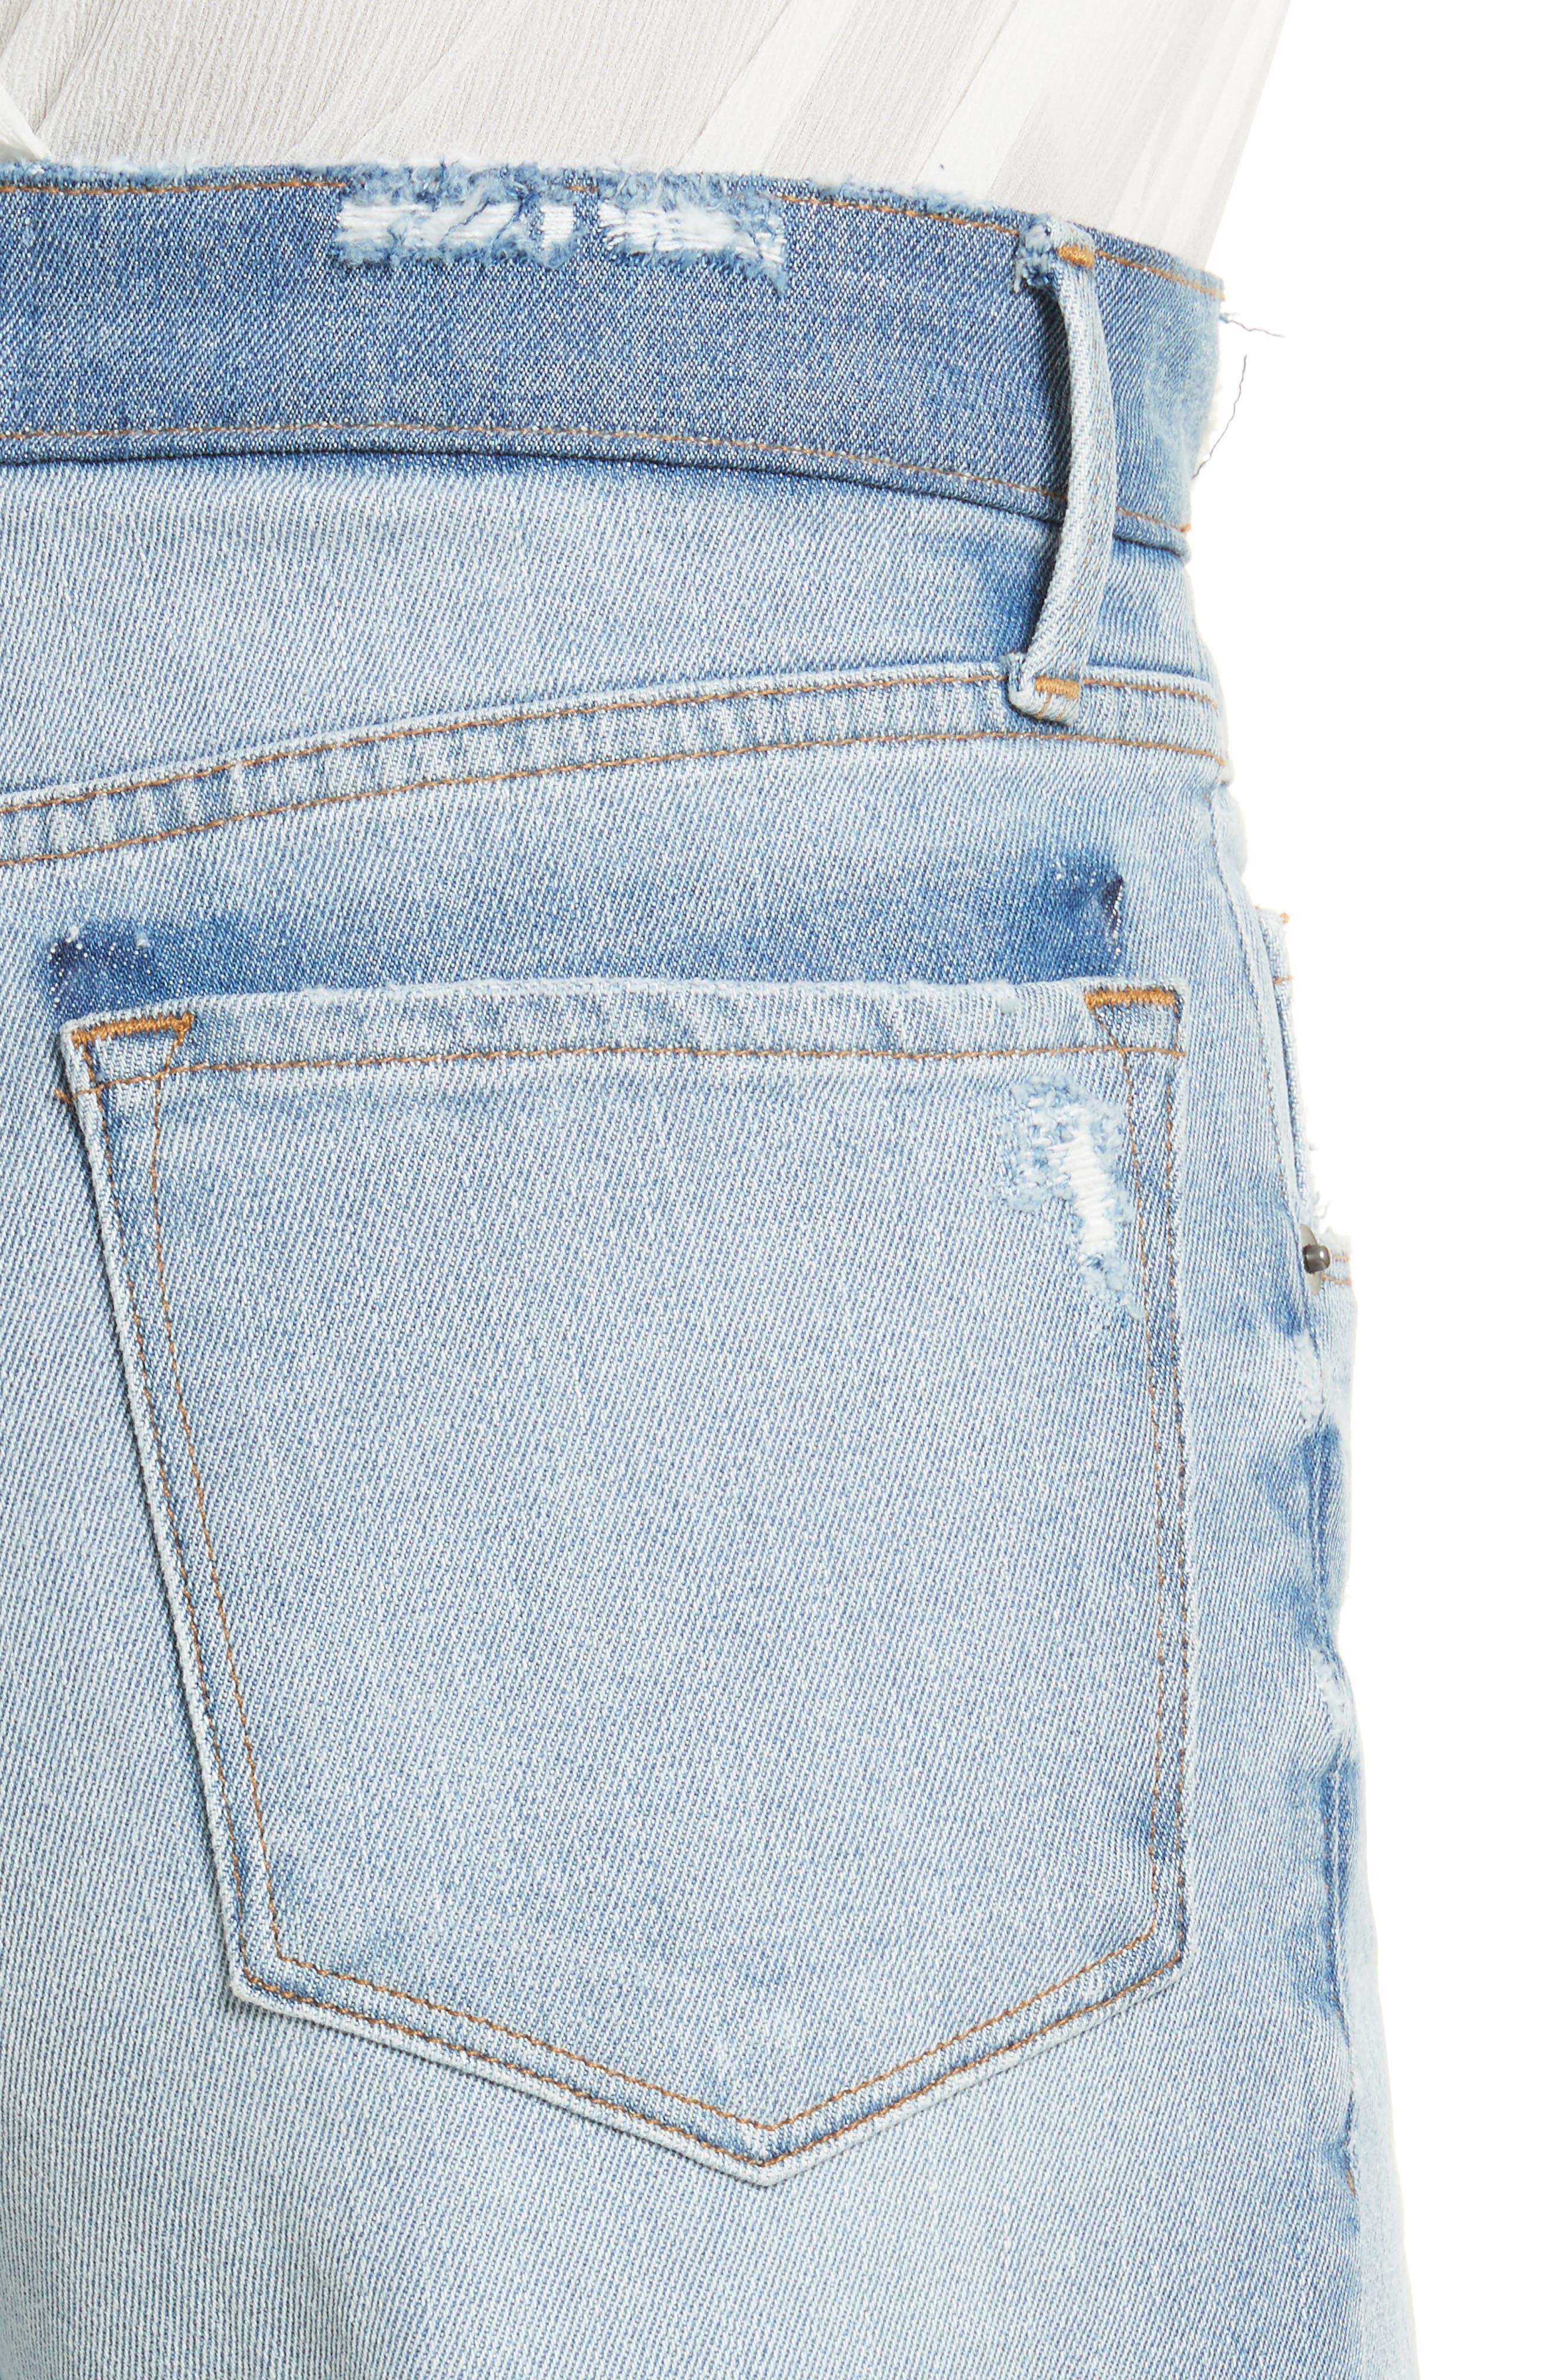 Le Reconstructed High Waist Crop Wide Leg Jeans,                             Alternate thumbnail 5, color,                             Blue